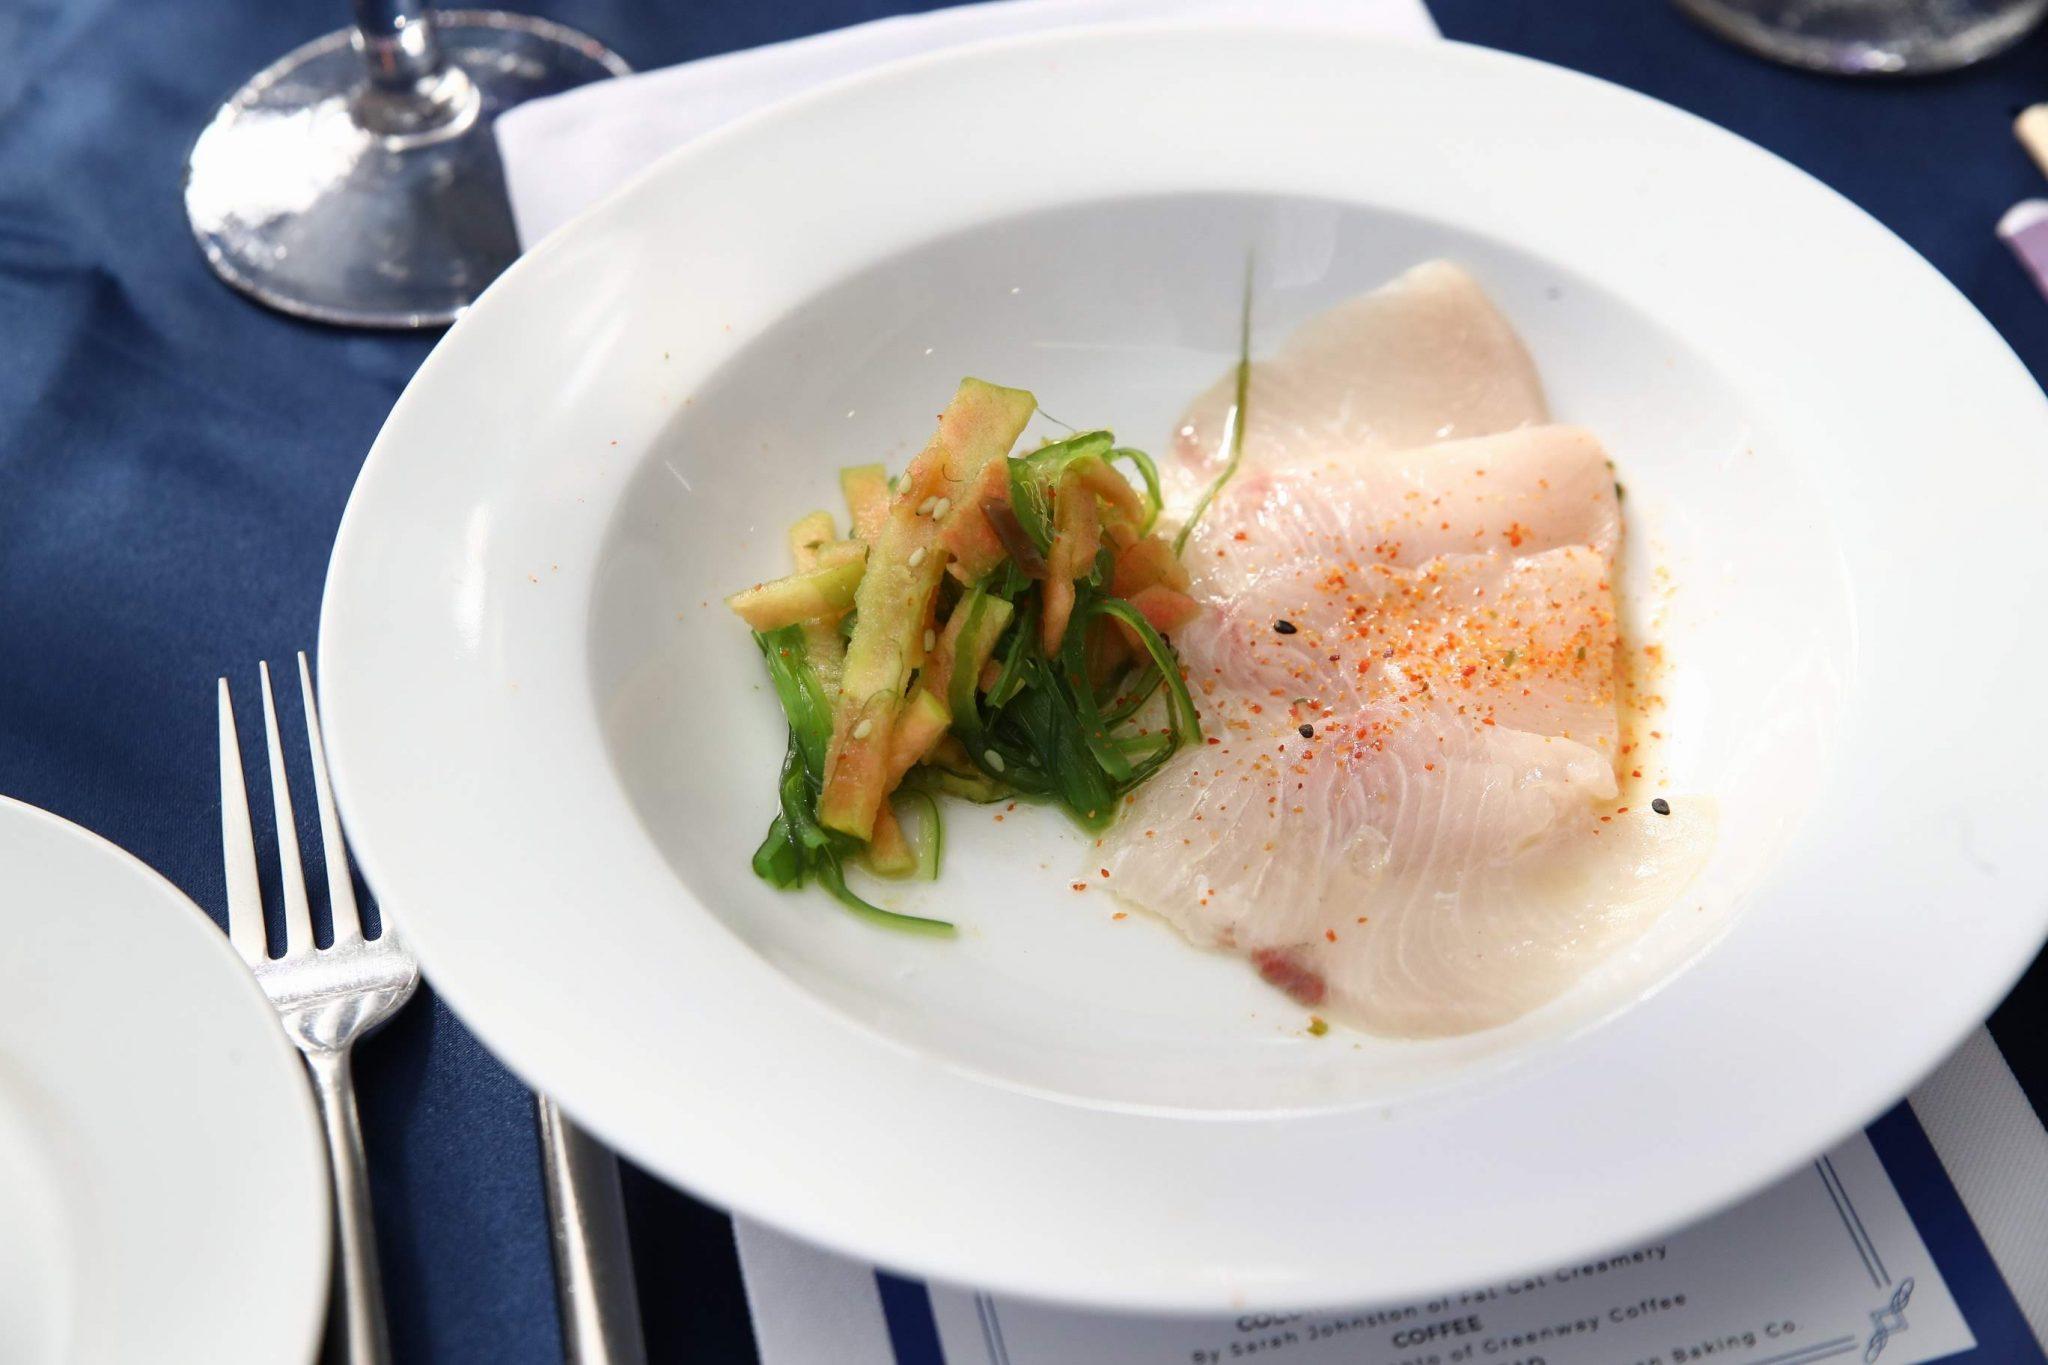 Hamachi crudo by executive chef J.D. Woodward of 1751 Sea Bar